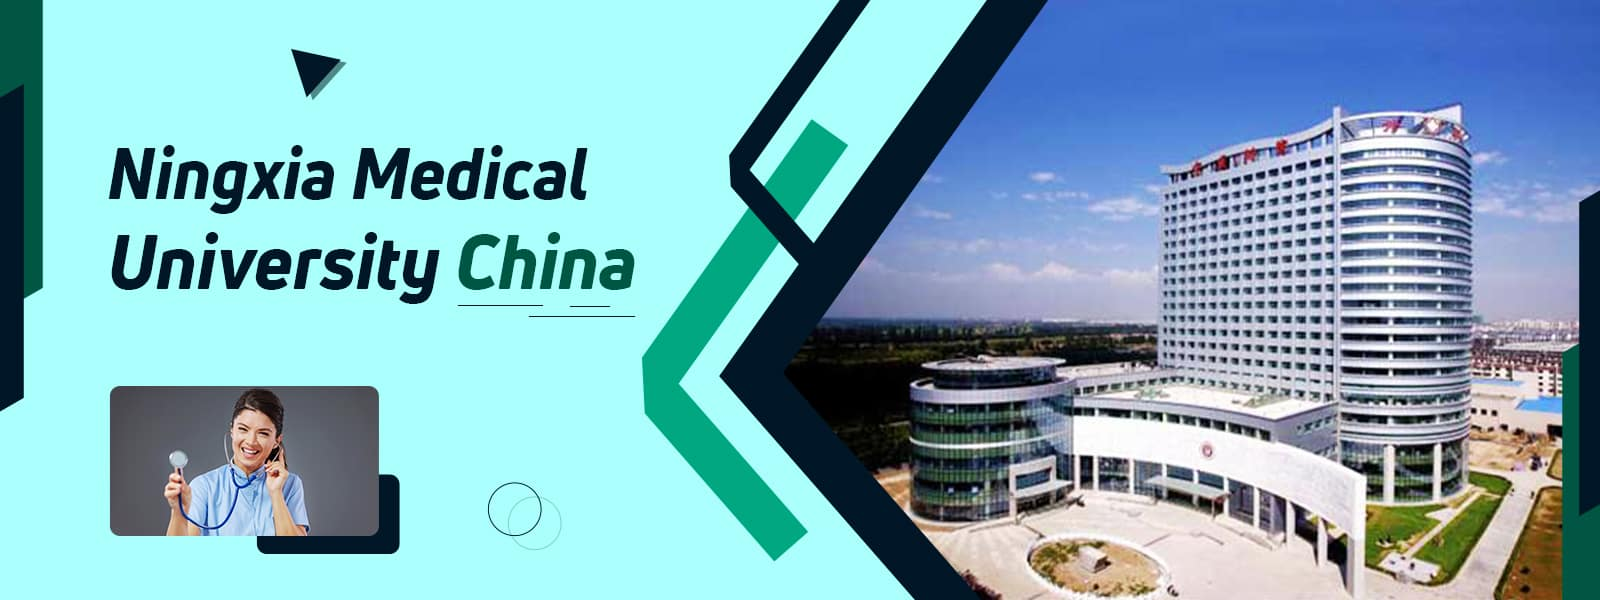 Ningxia Medical University NXMU China